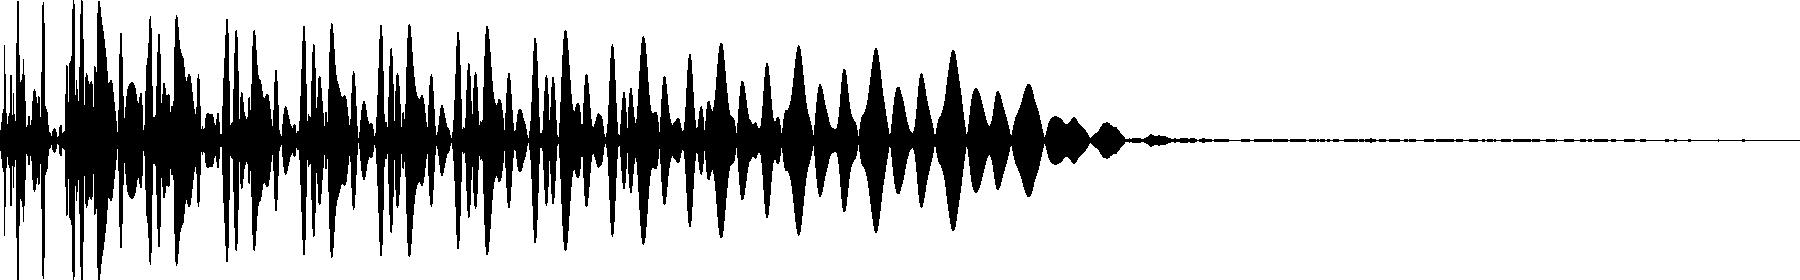 vedh bass cut 011 g